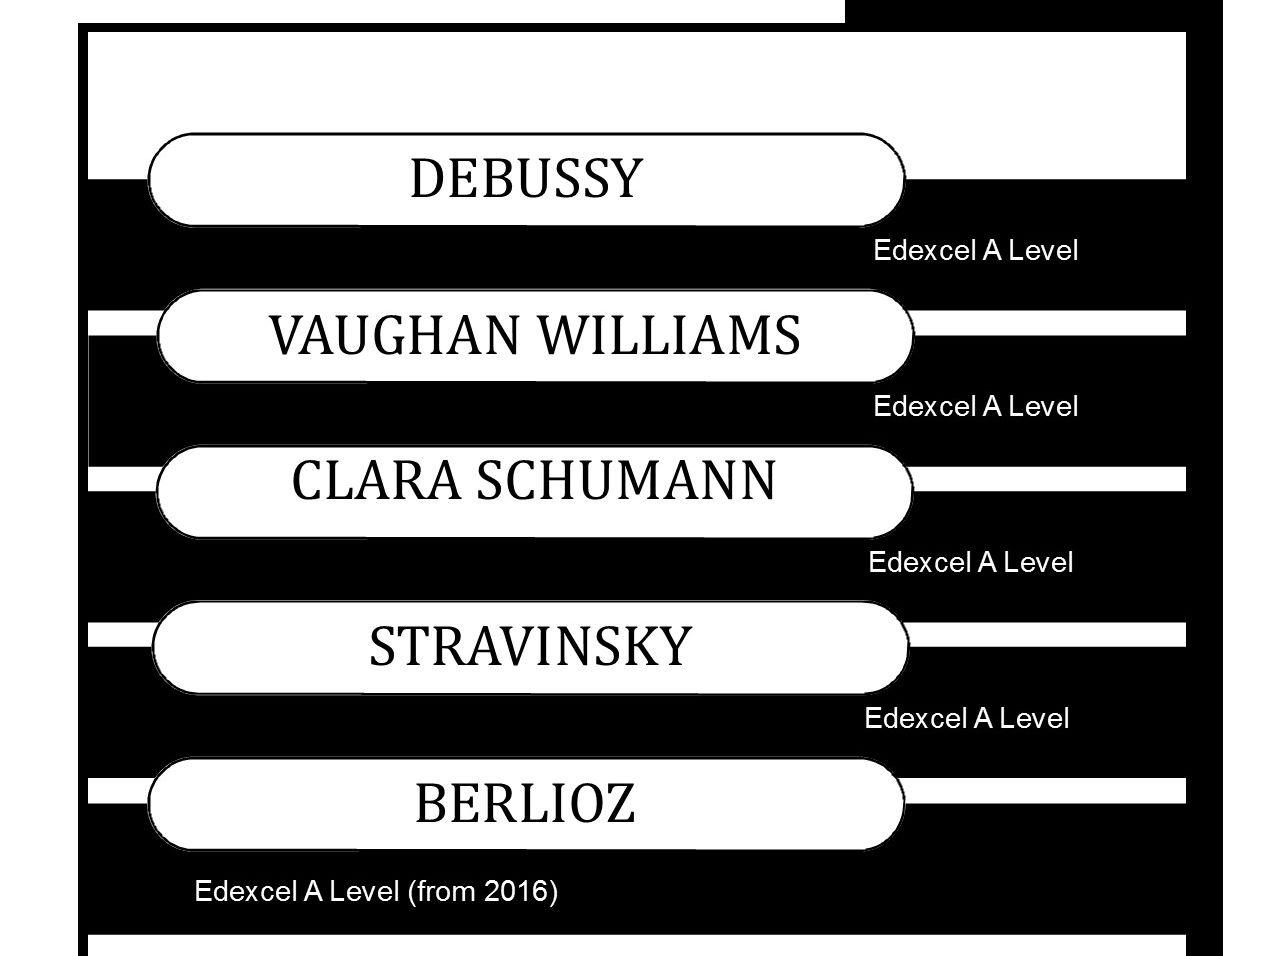 Edexcel Music A Level Bundle of Berlioz, Stravinsky, Debussy, Vaughan Williams, Clara Schumann